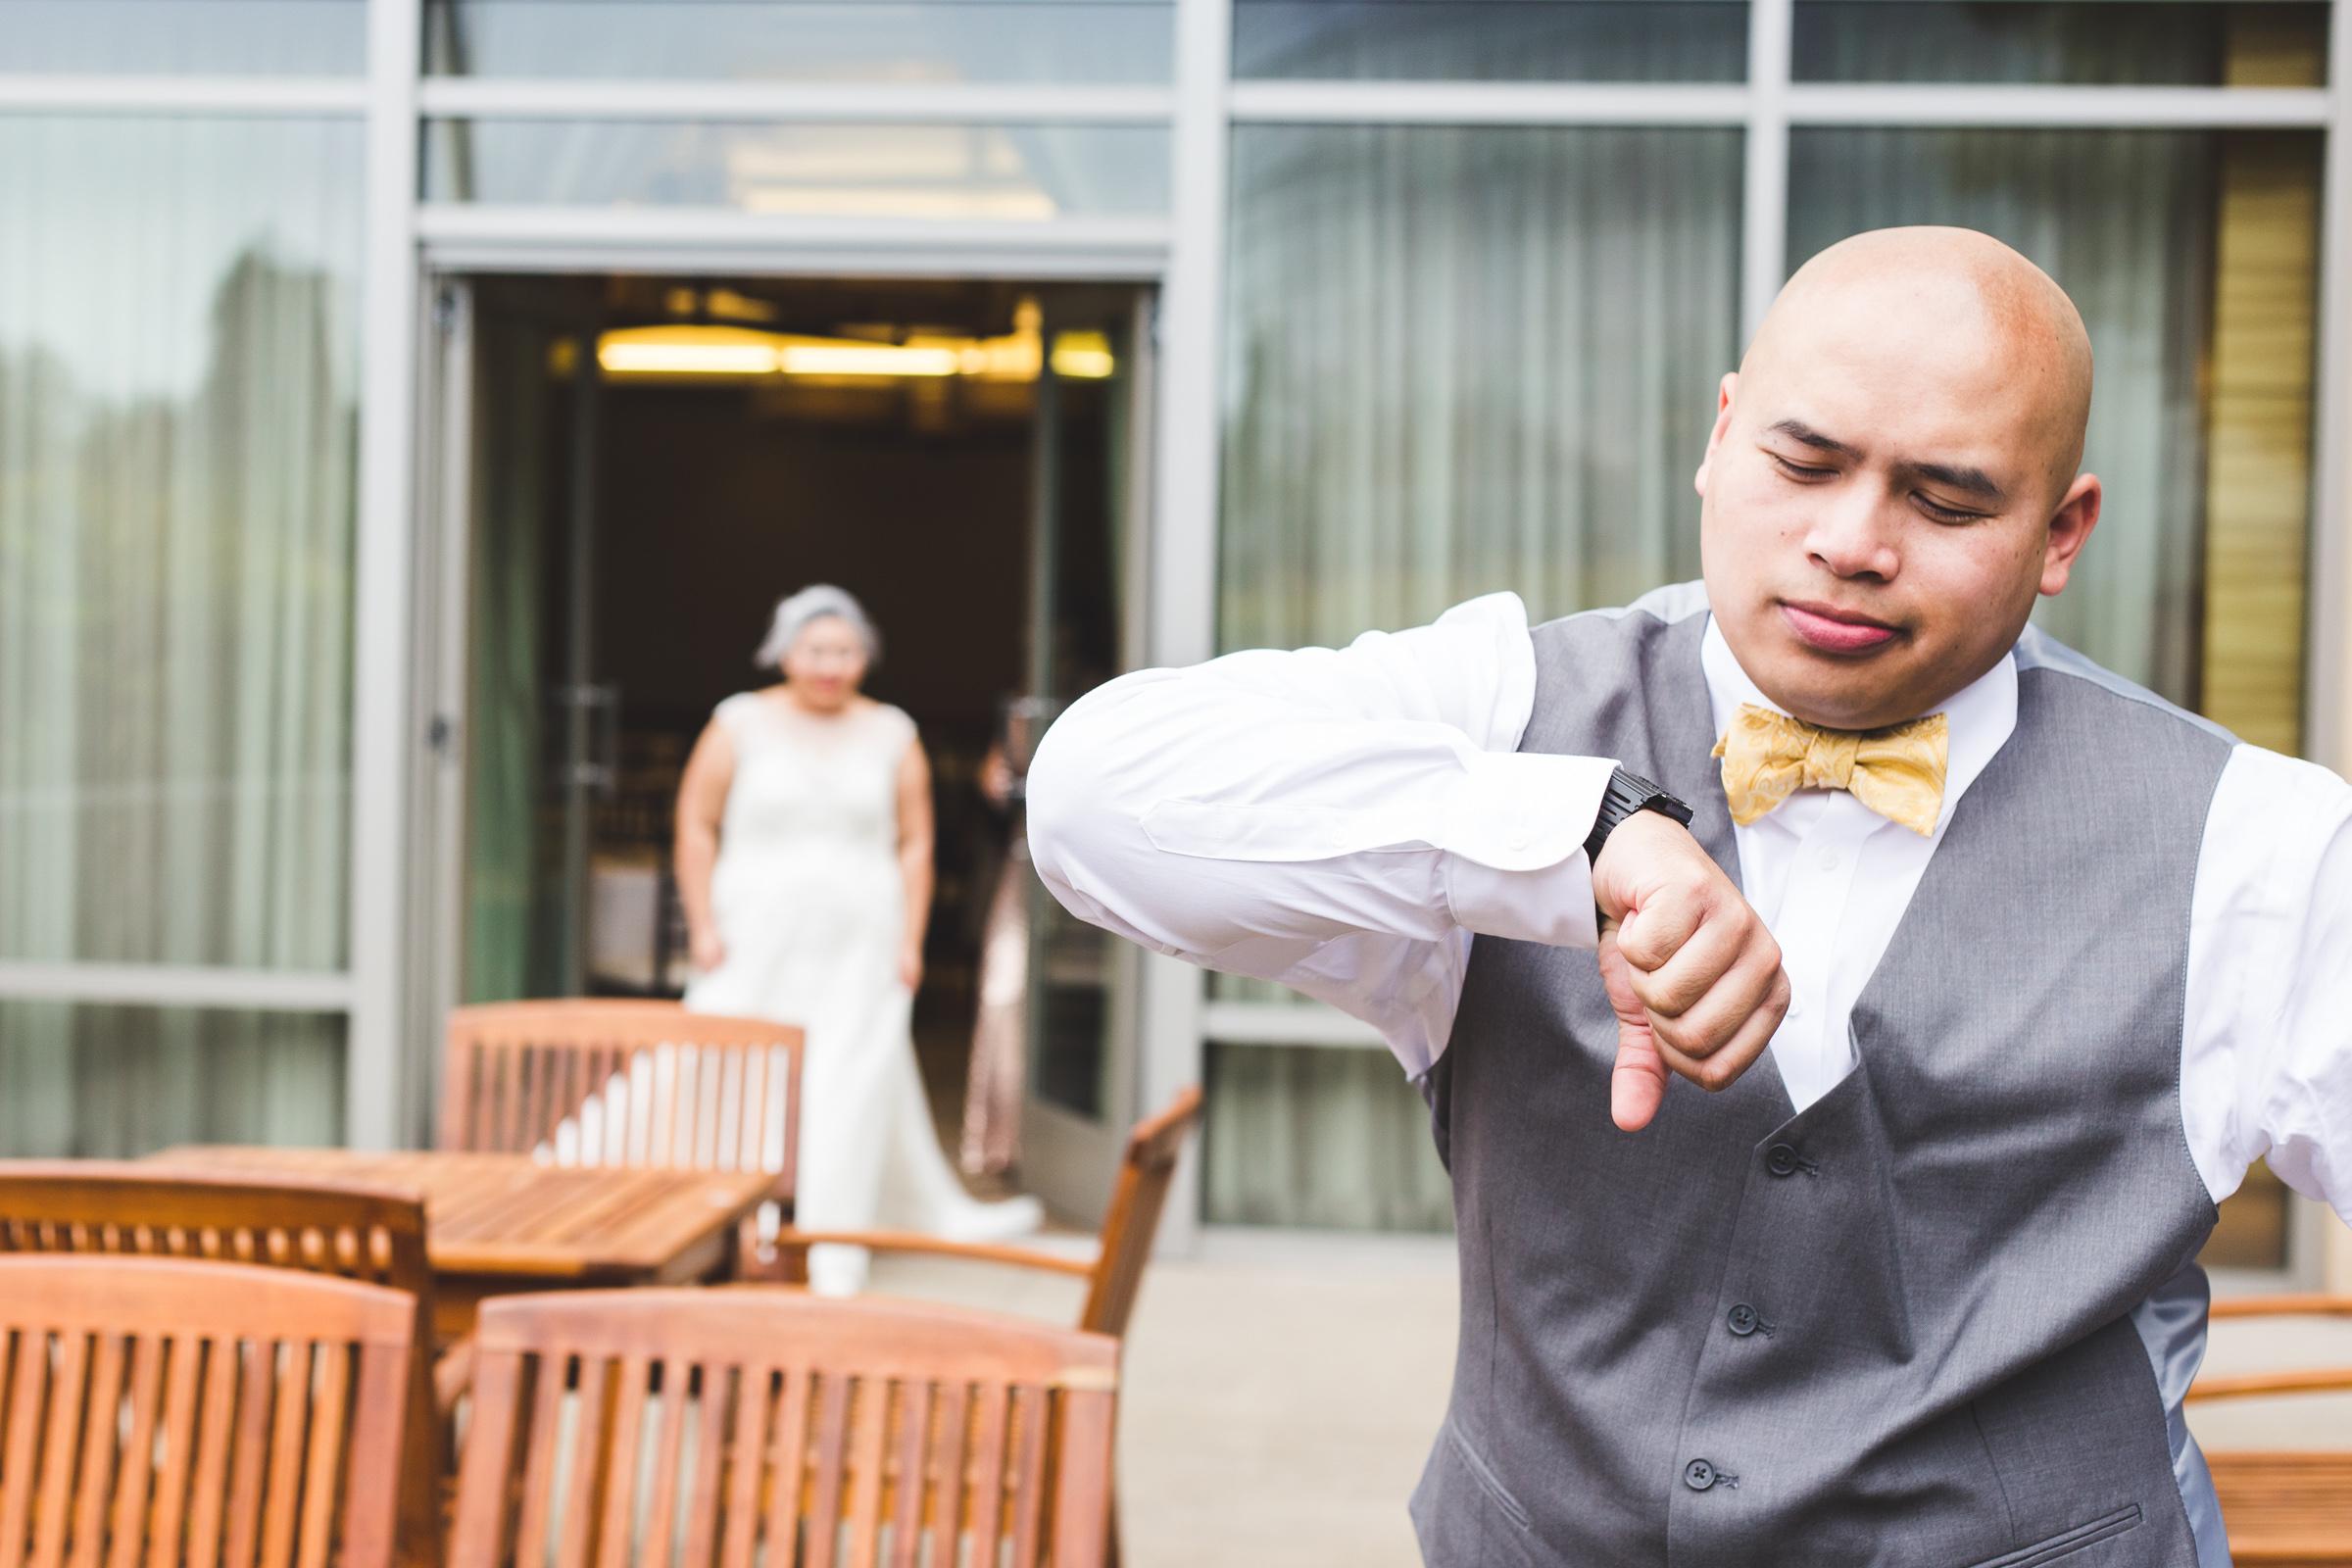 LisaRichard-Seattle-Wedding-052816-0058.jpg